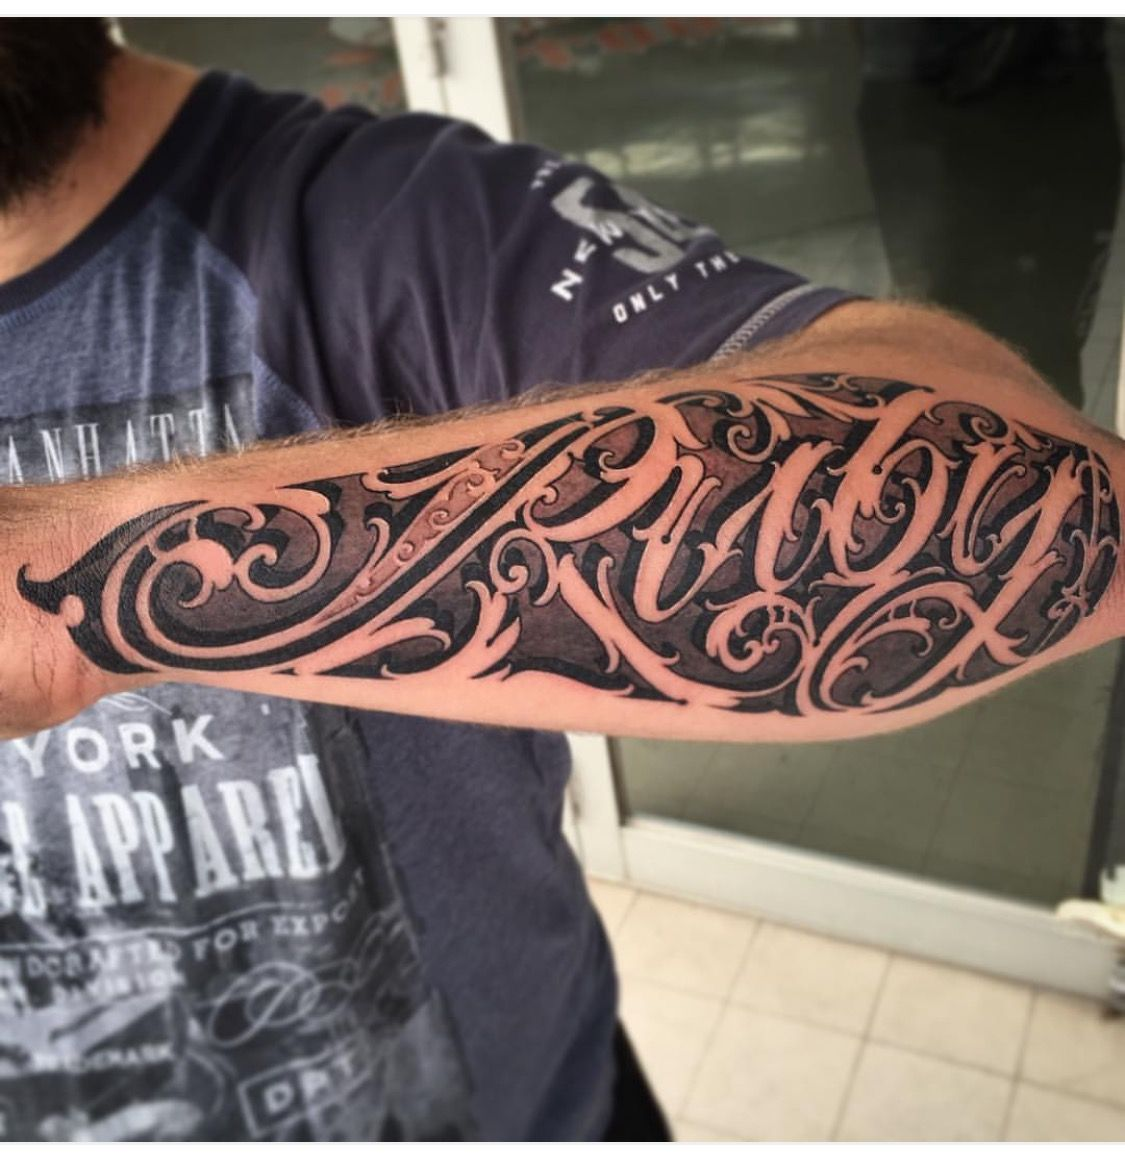 Pinterest Lovemebeauty85 Tatuajes De Nombres Disenos De Tatuajes Para Hombres Tatuajes De Nombres En El Brazo